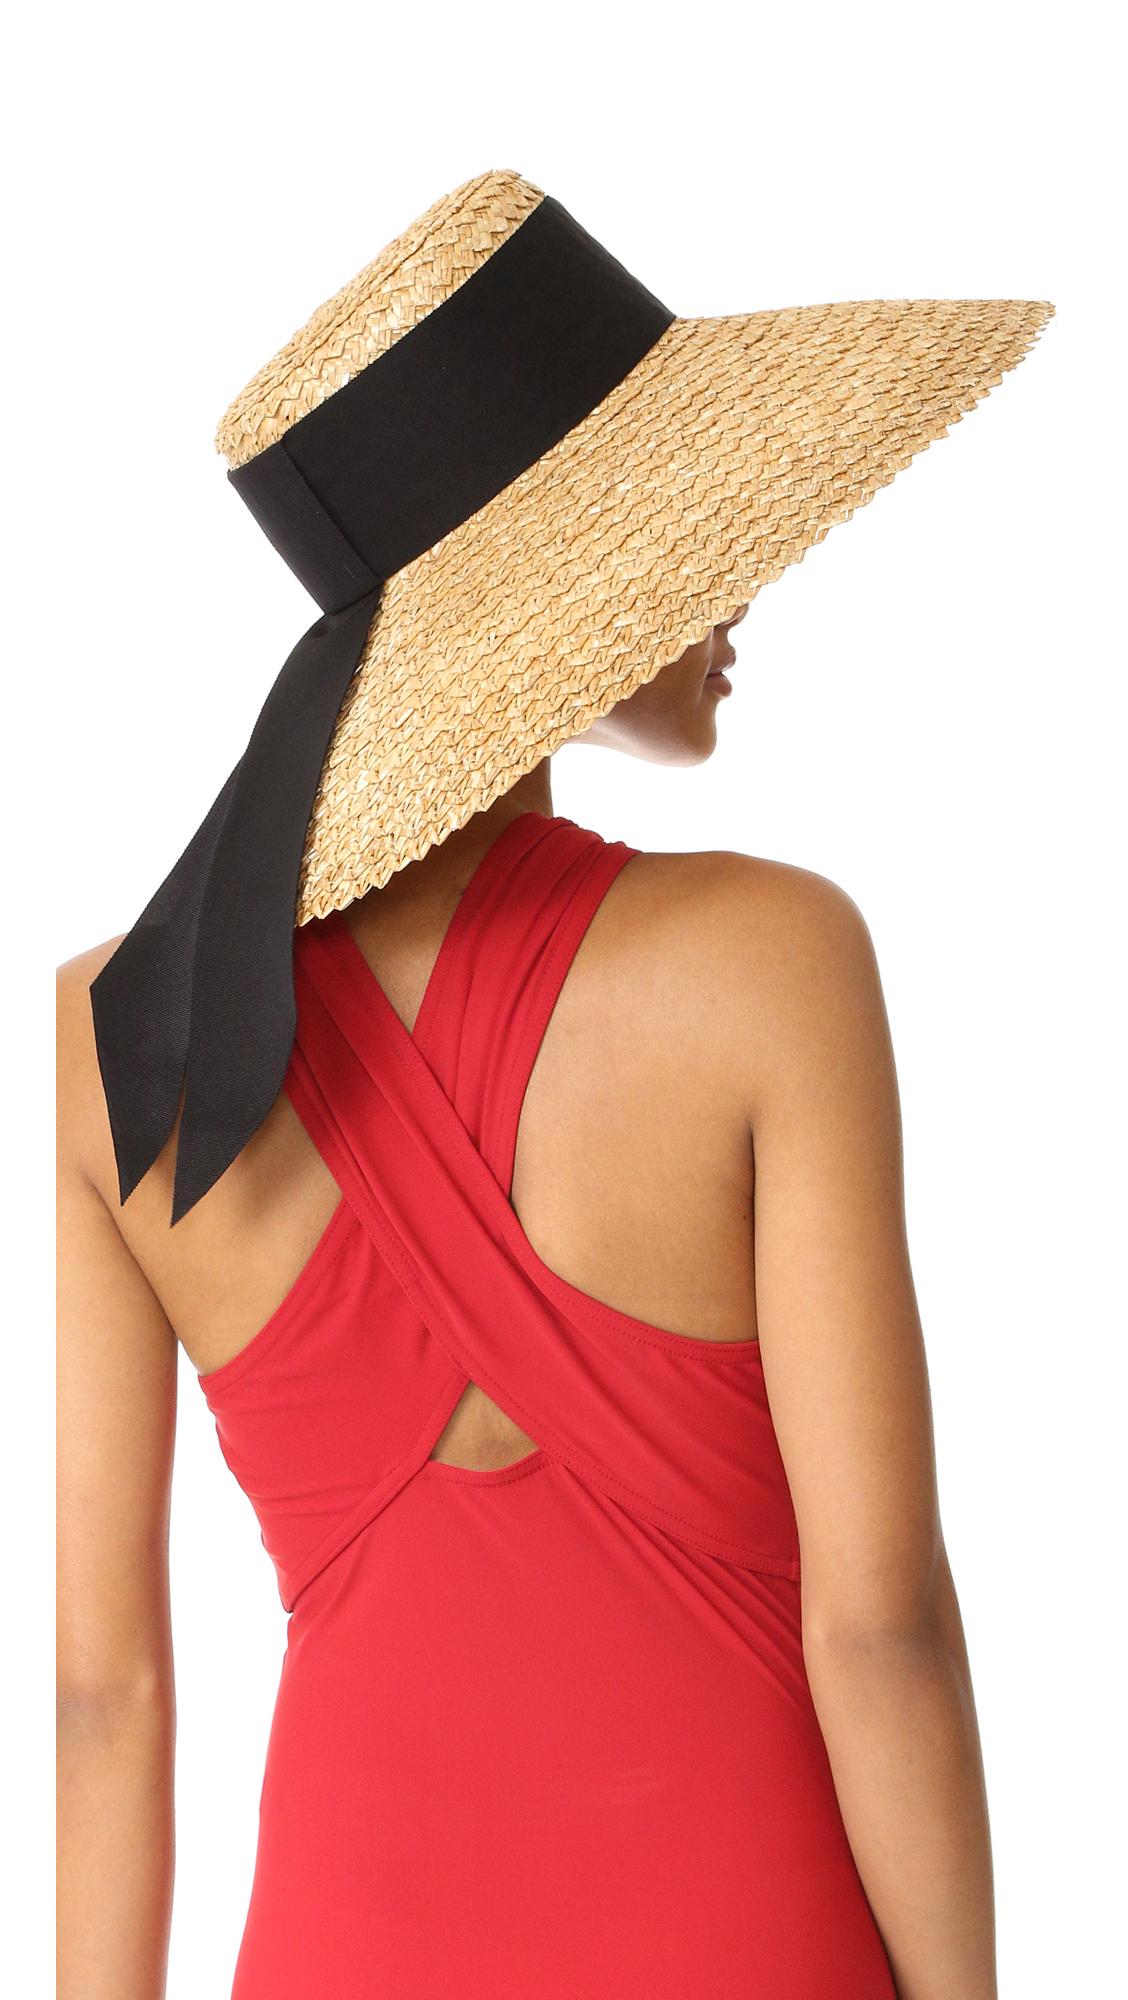 Eugenia Kim Mirabel Hat - Natural at Shopbop